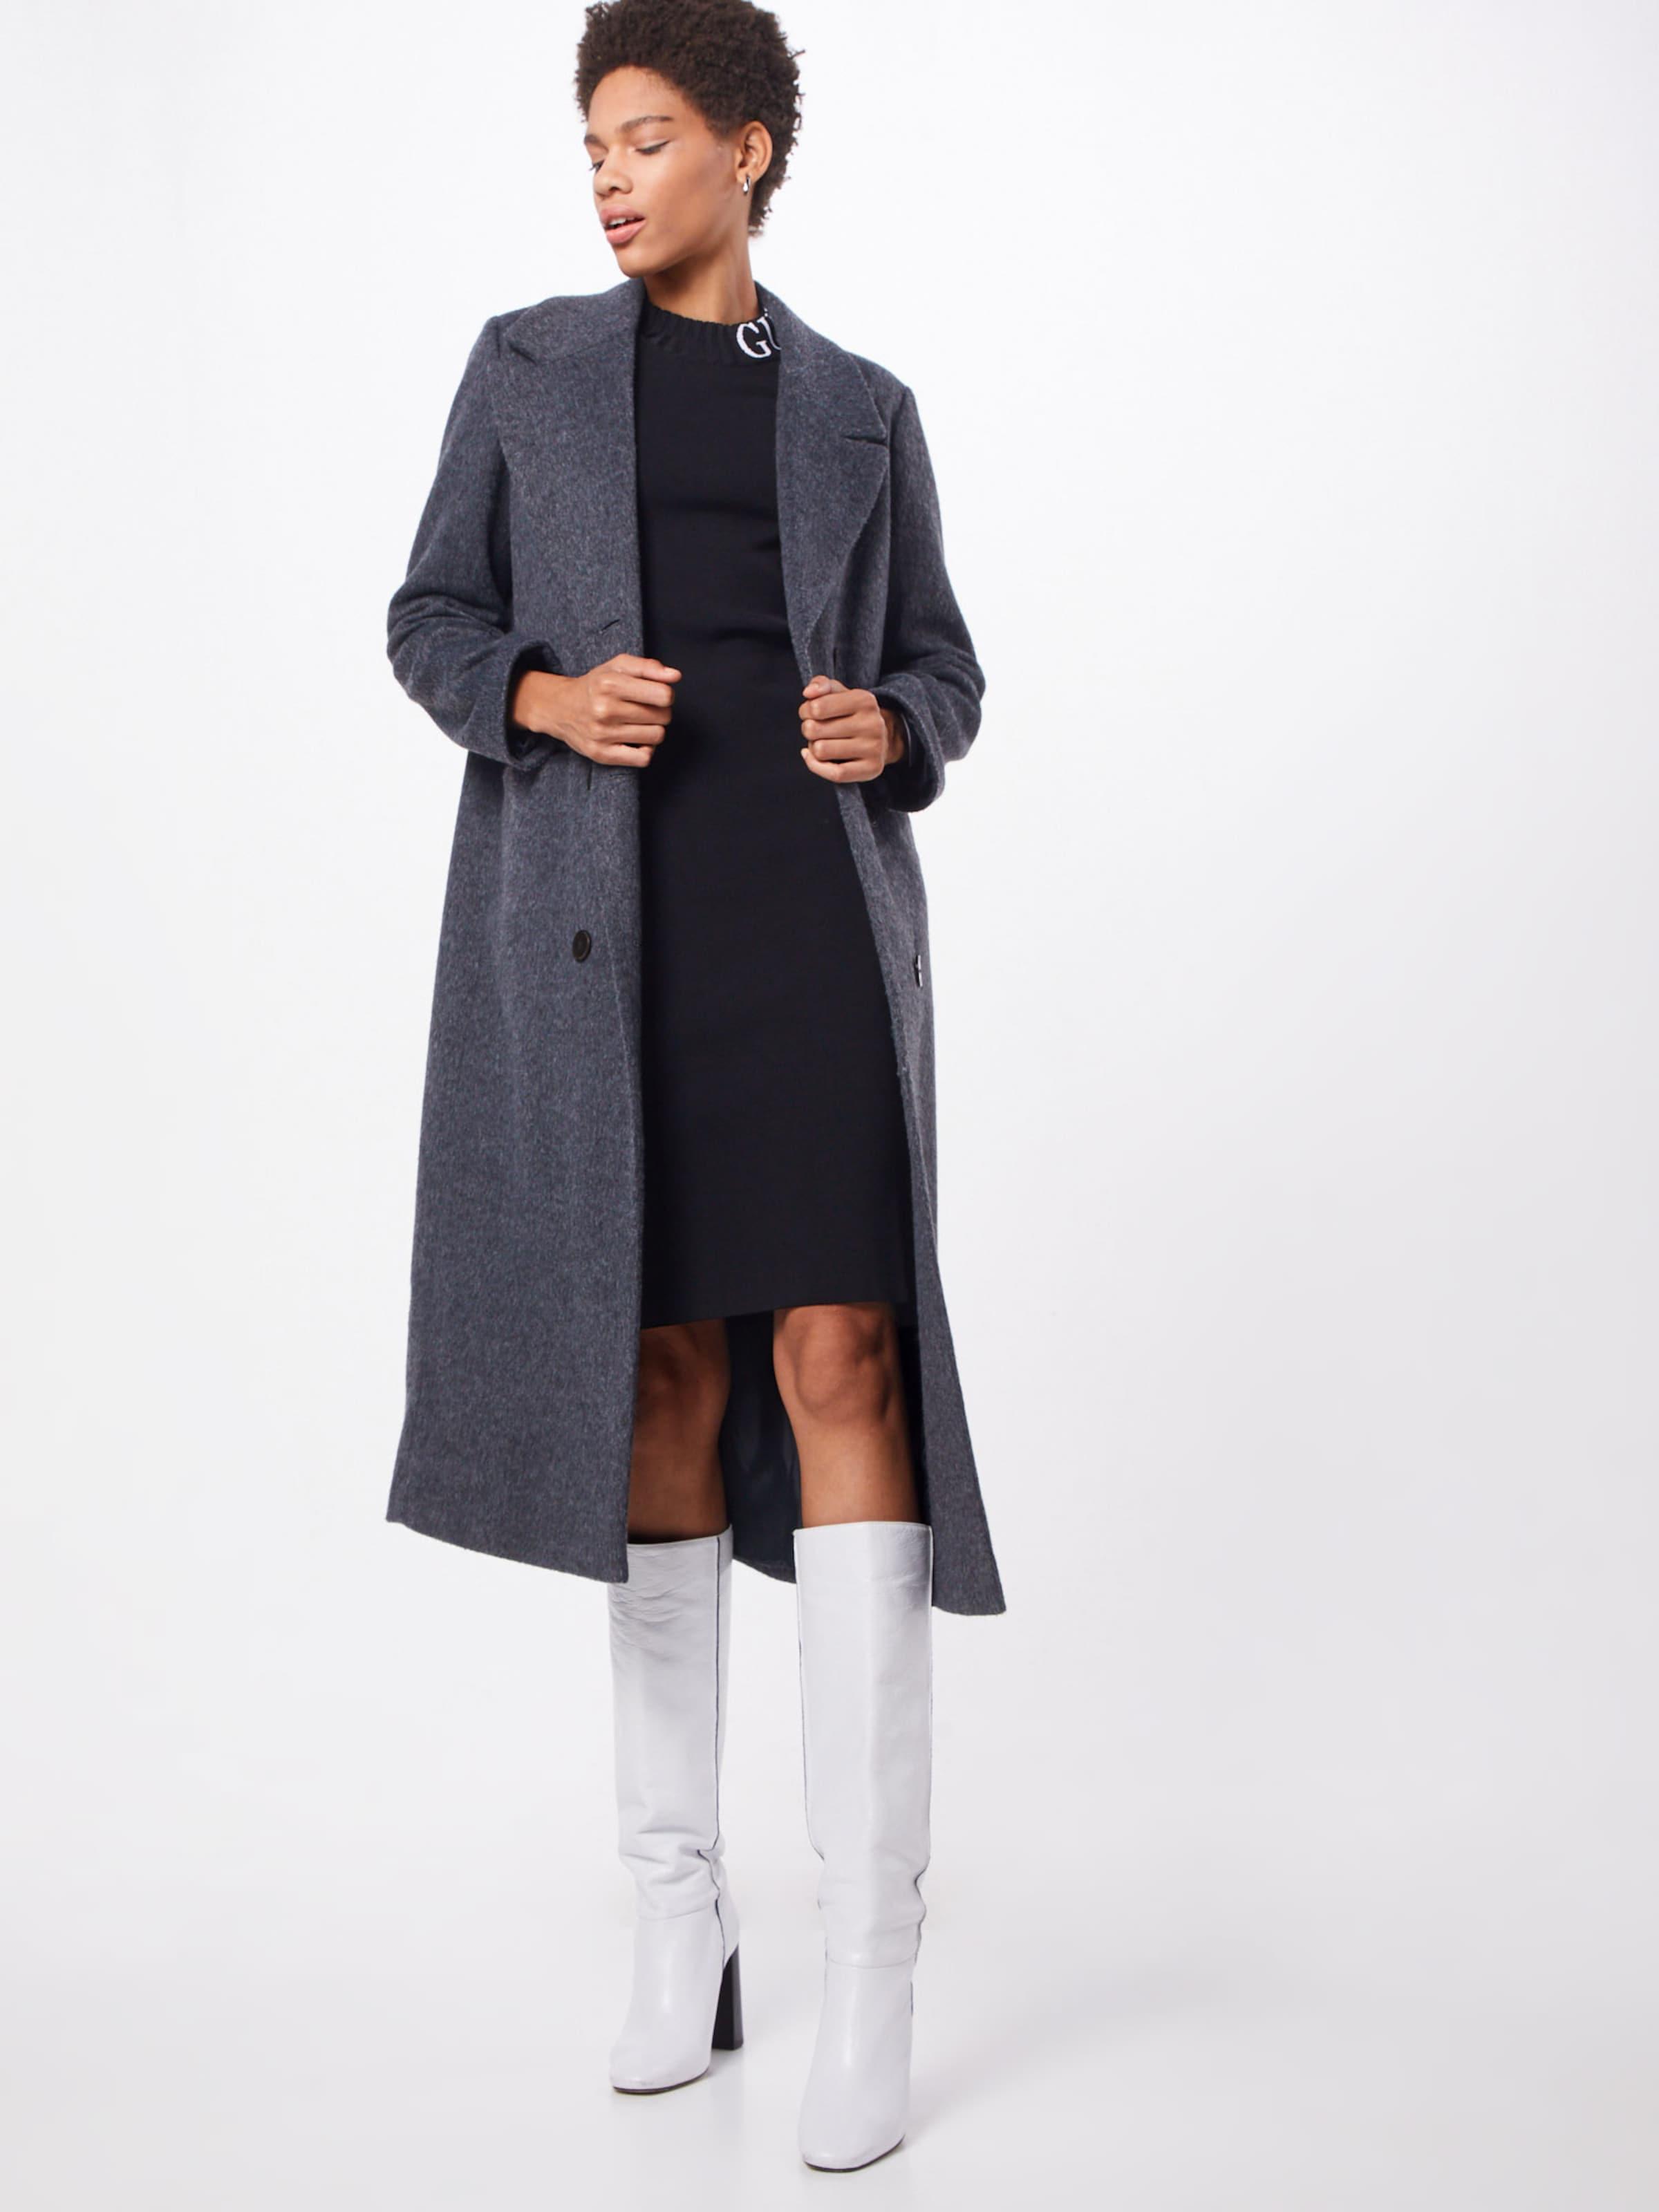 'carla' Robe Guess 'carla' En Robe Guess Guess Noir Robe En Noir VMUpSz